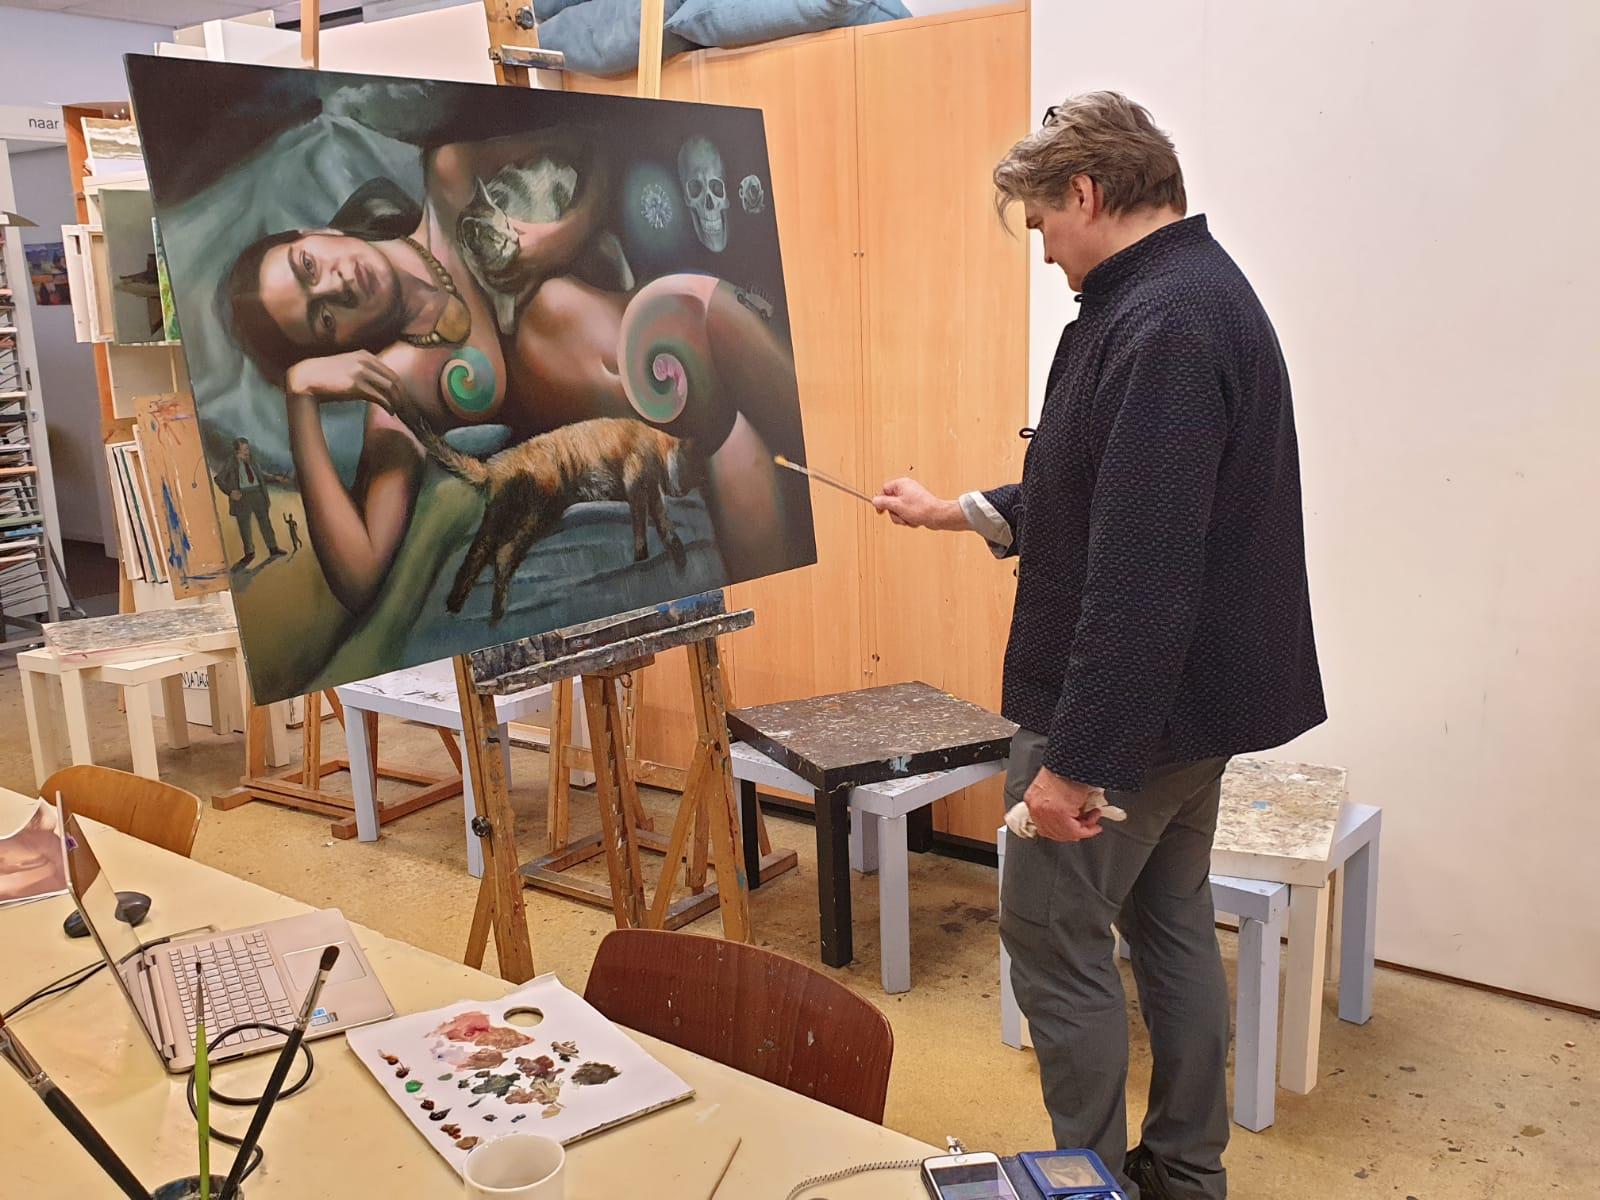 Corne Akkers painting Frida Kahlo at Brugman Art